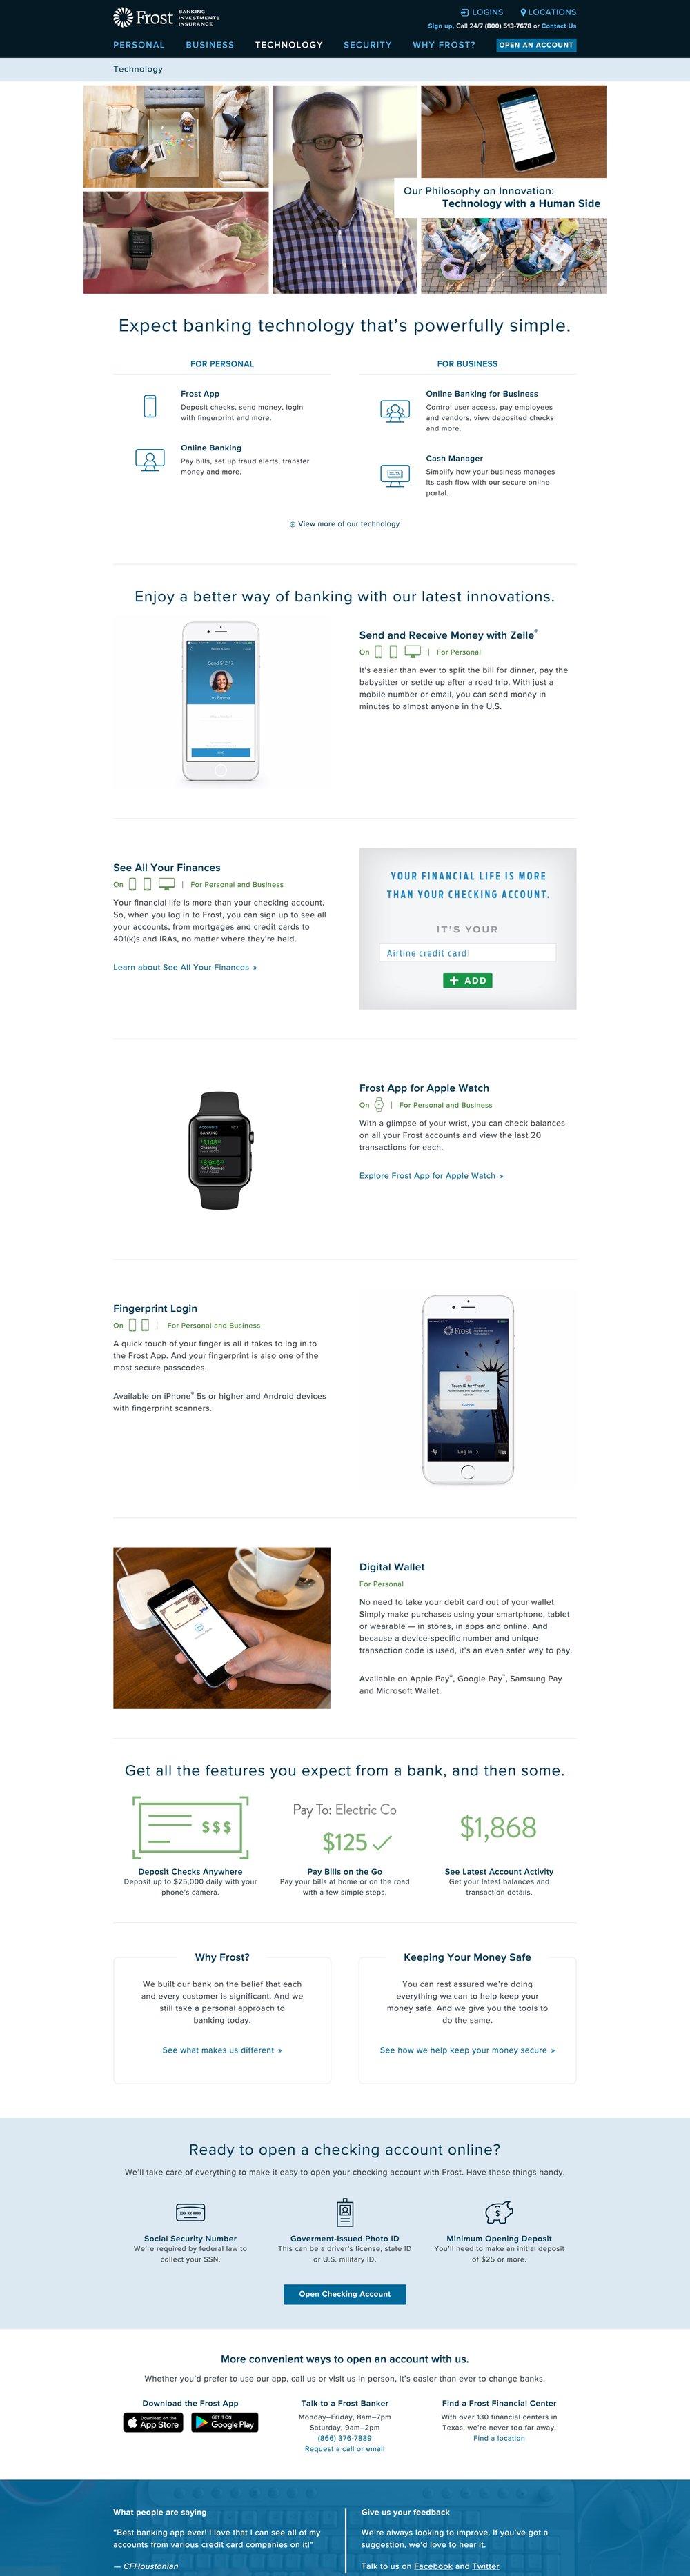 www.frostbank.com_banking_financial-technology_.jpg